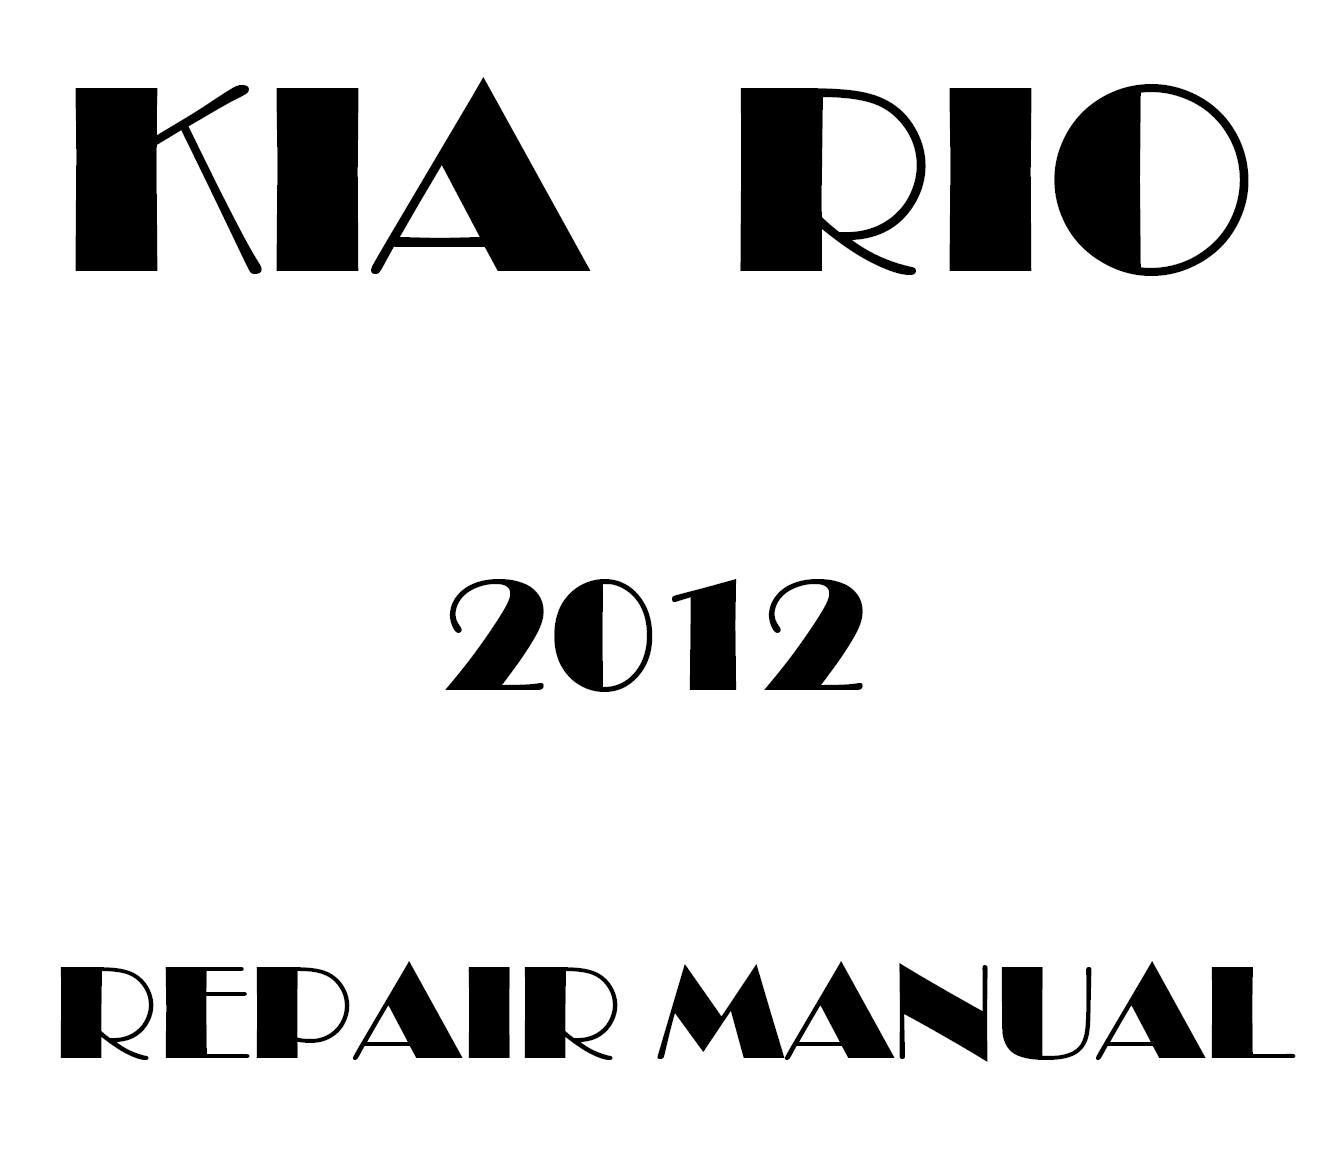 2012 Kia Rio repair manual